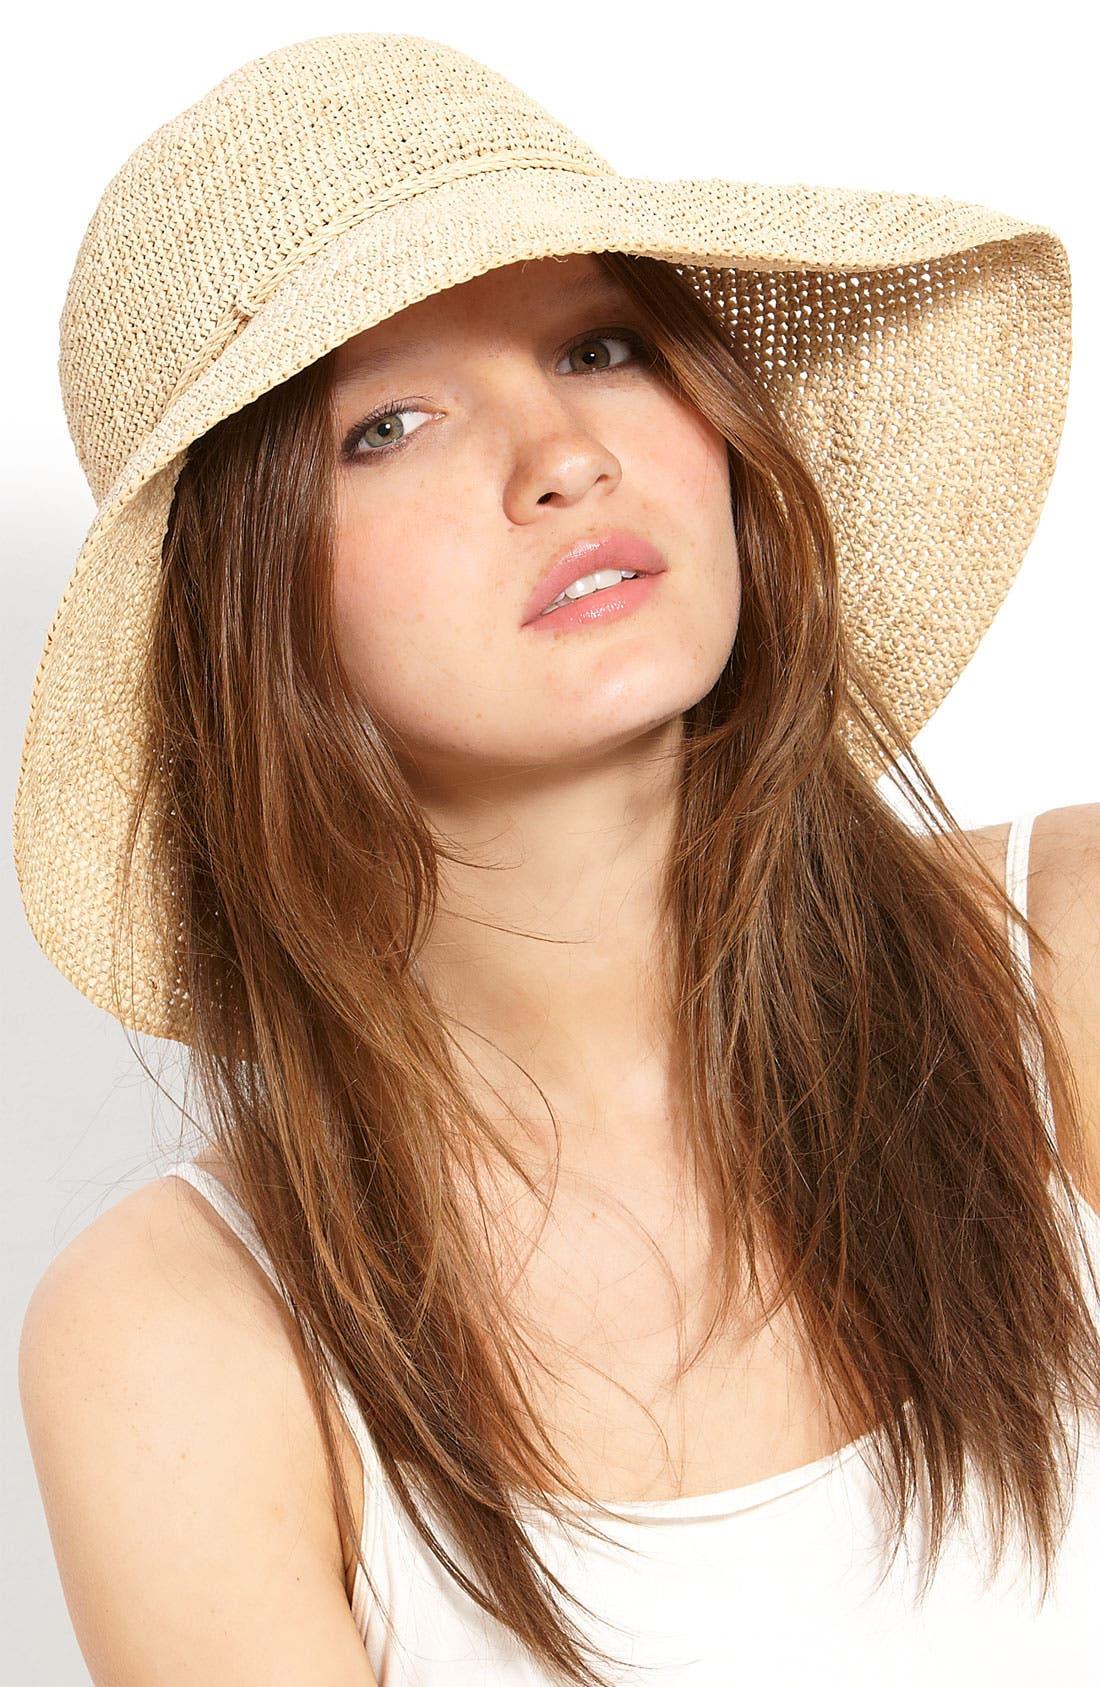 HELEN KAMINSKI 'Provence 12' Packable Raffia Hat, Main, color, NATURAL